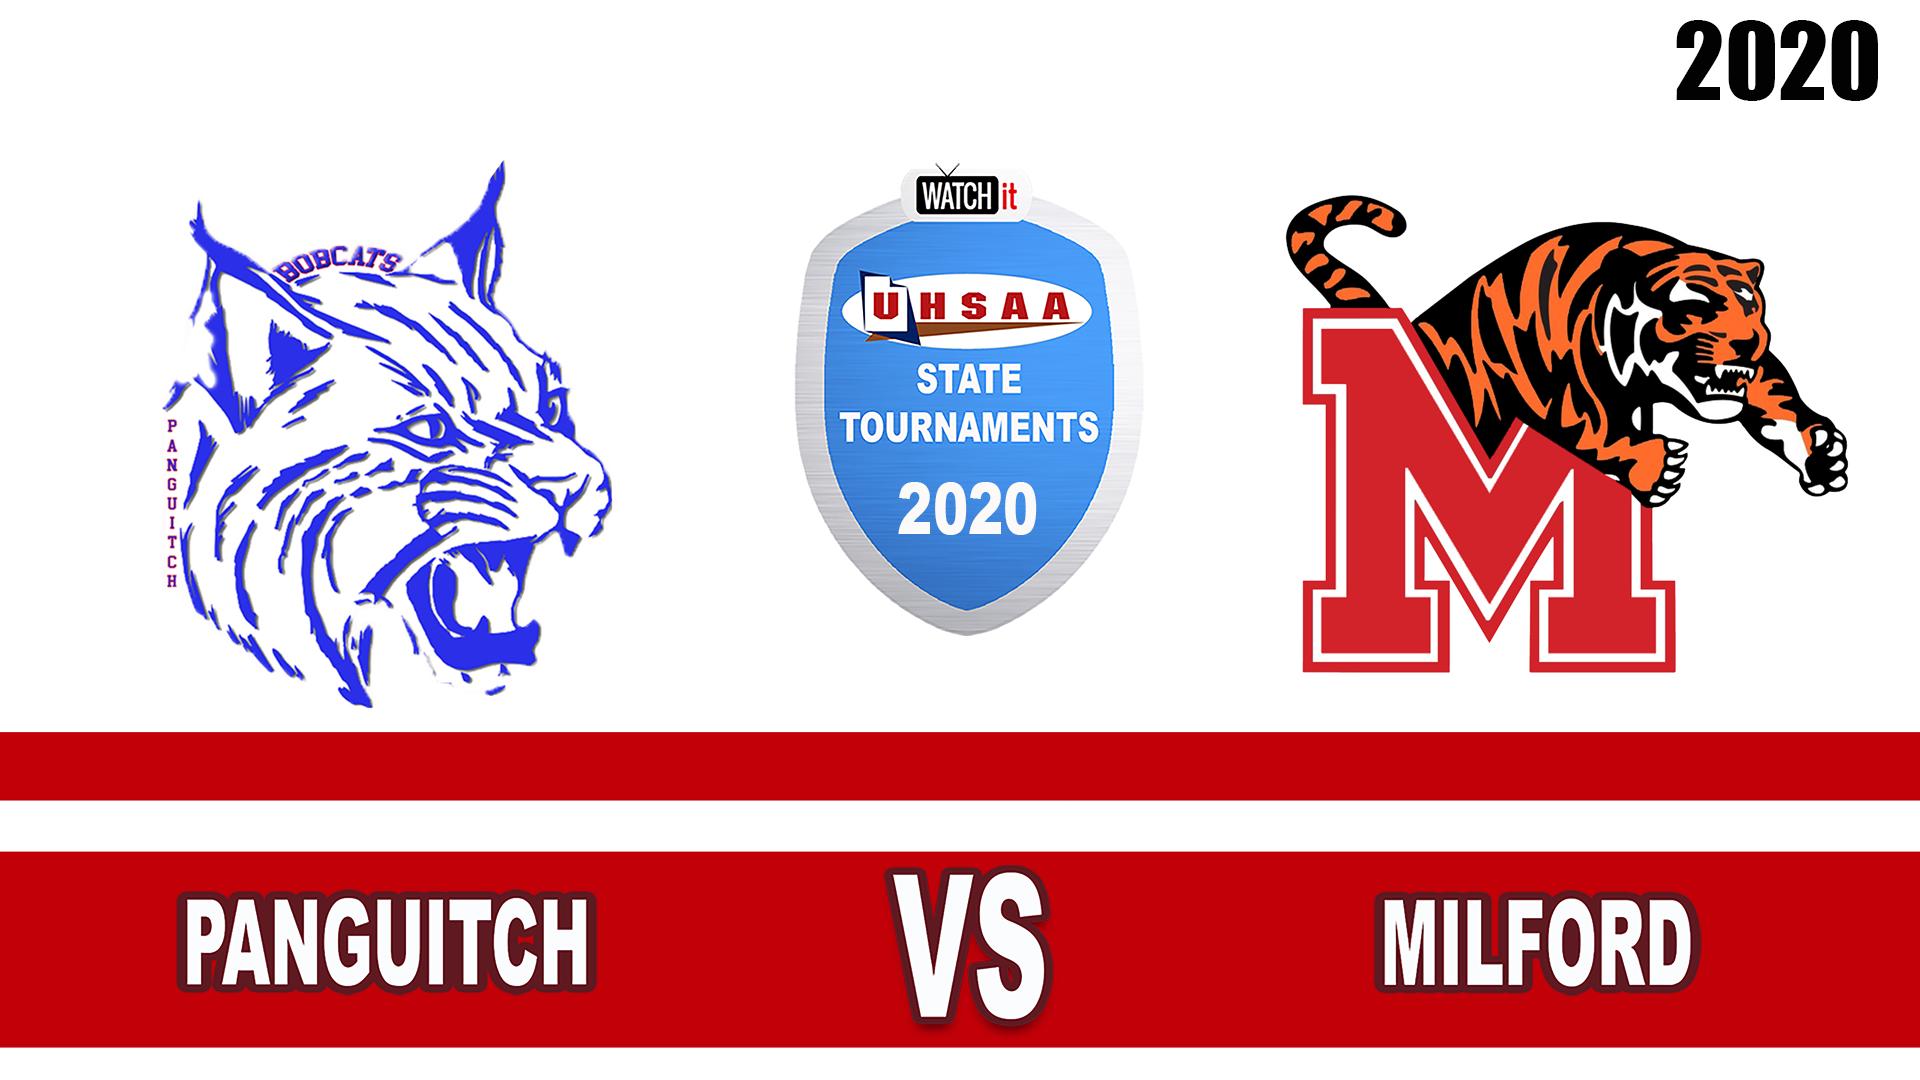 Panguitch vs Milford